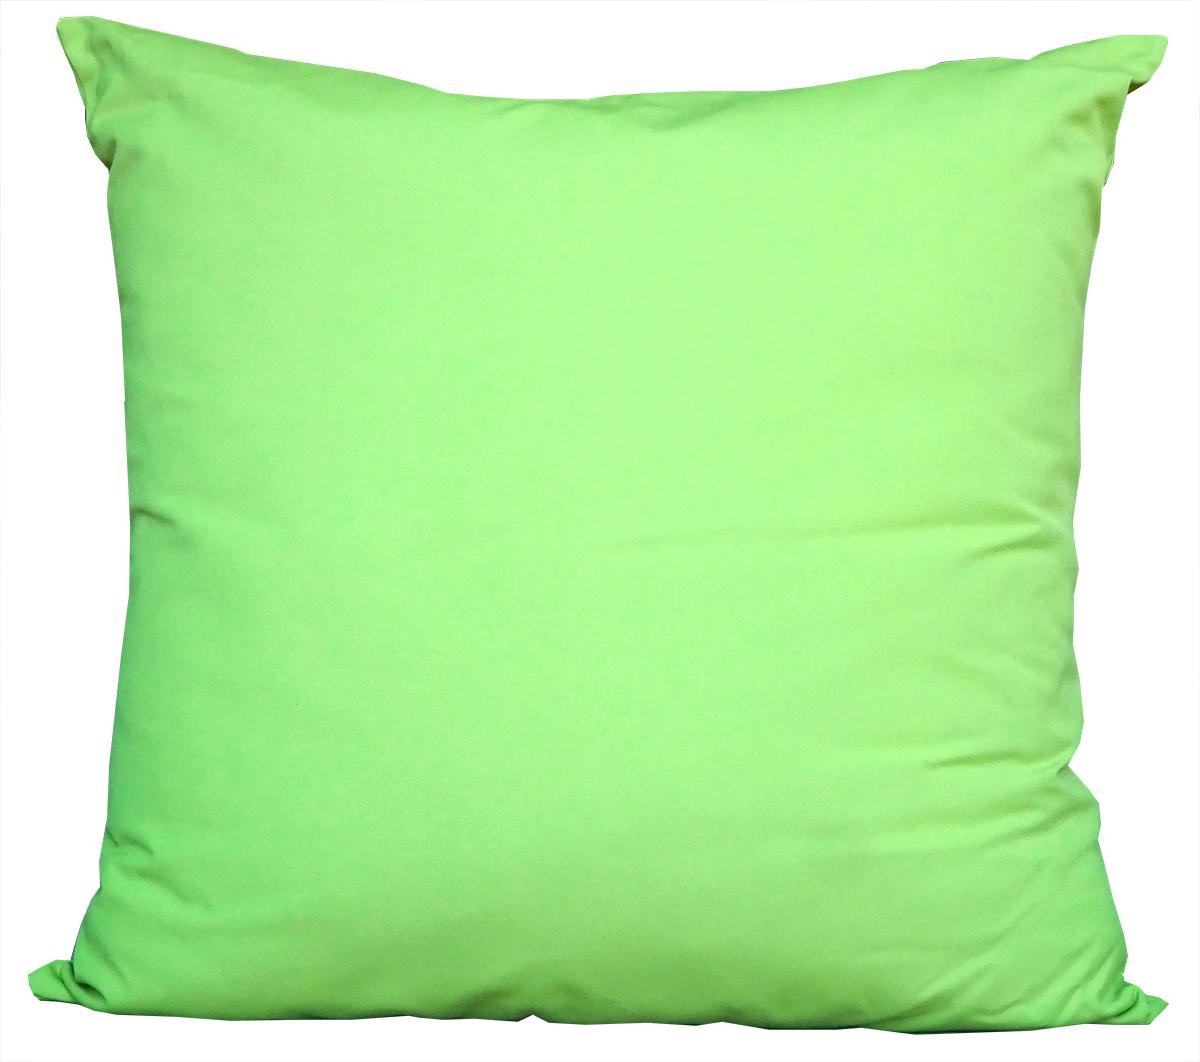 Floor Cushions Outdoor : Lime - 85x85cm Floor Cushion - Outdoor Interiors